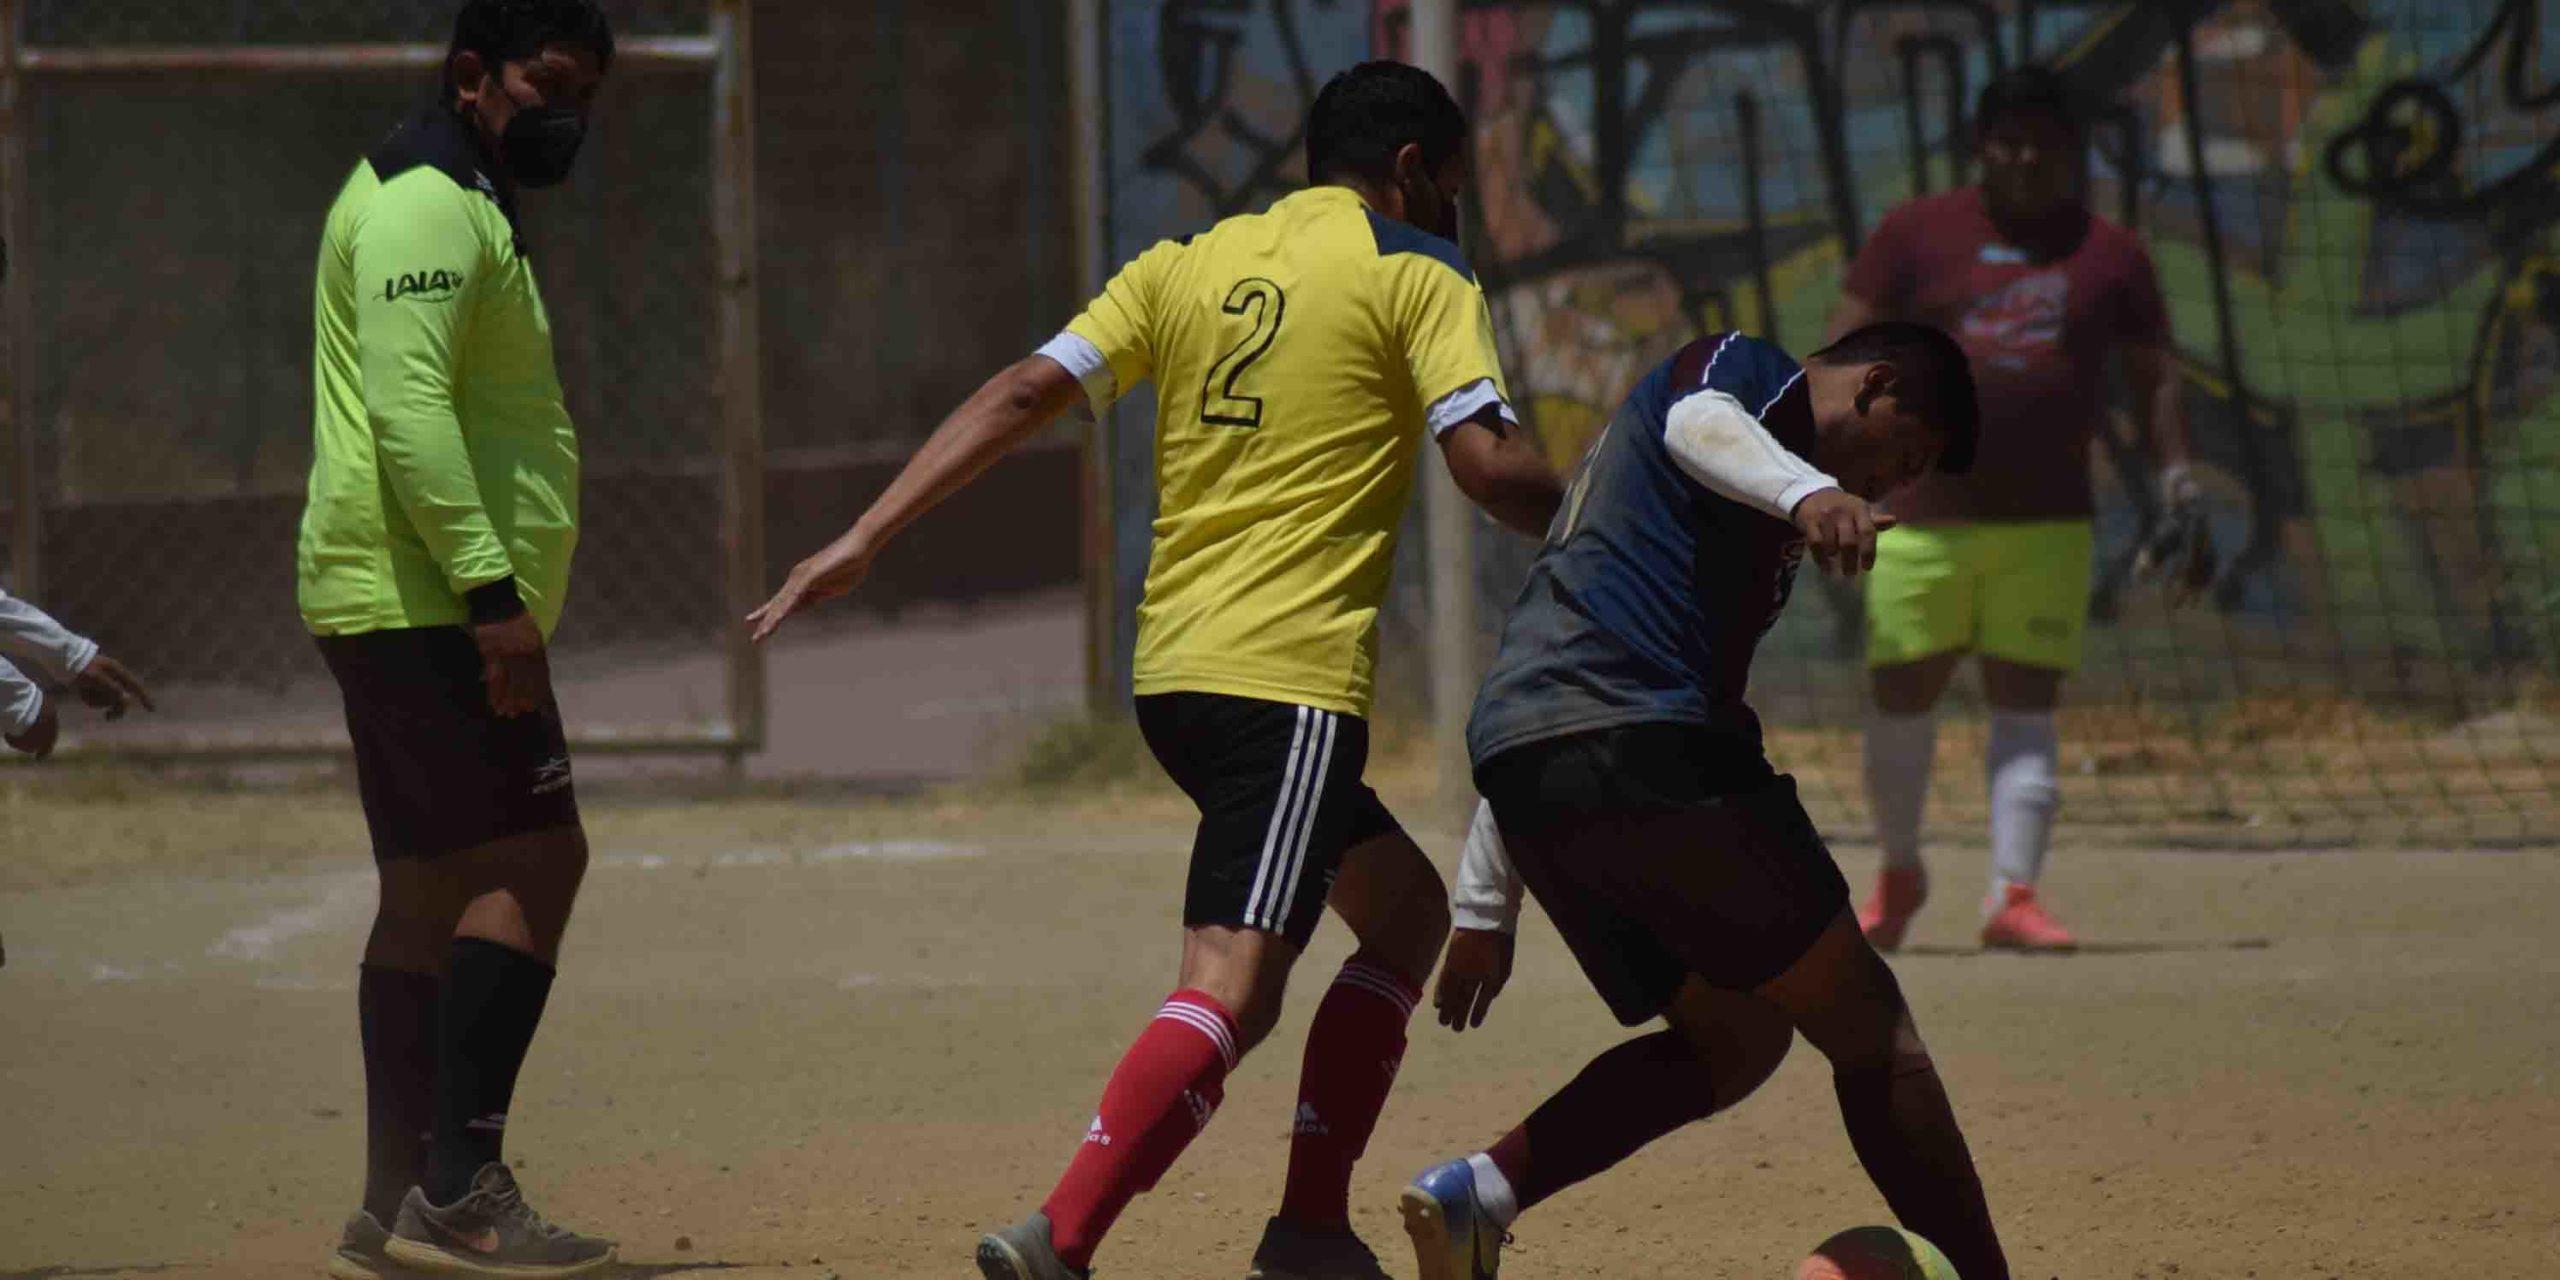 Intensa cartelera en la Liga de fútbol Libertad | El Imparcial de Oaxaca